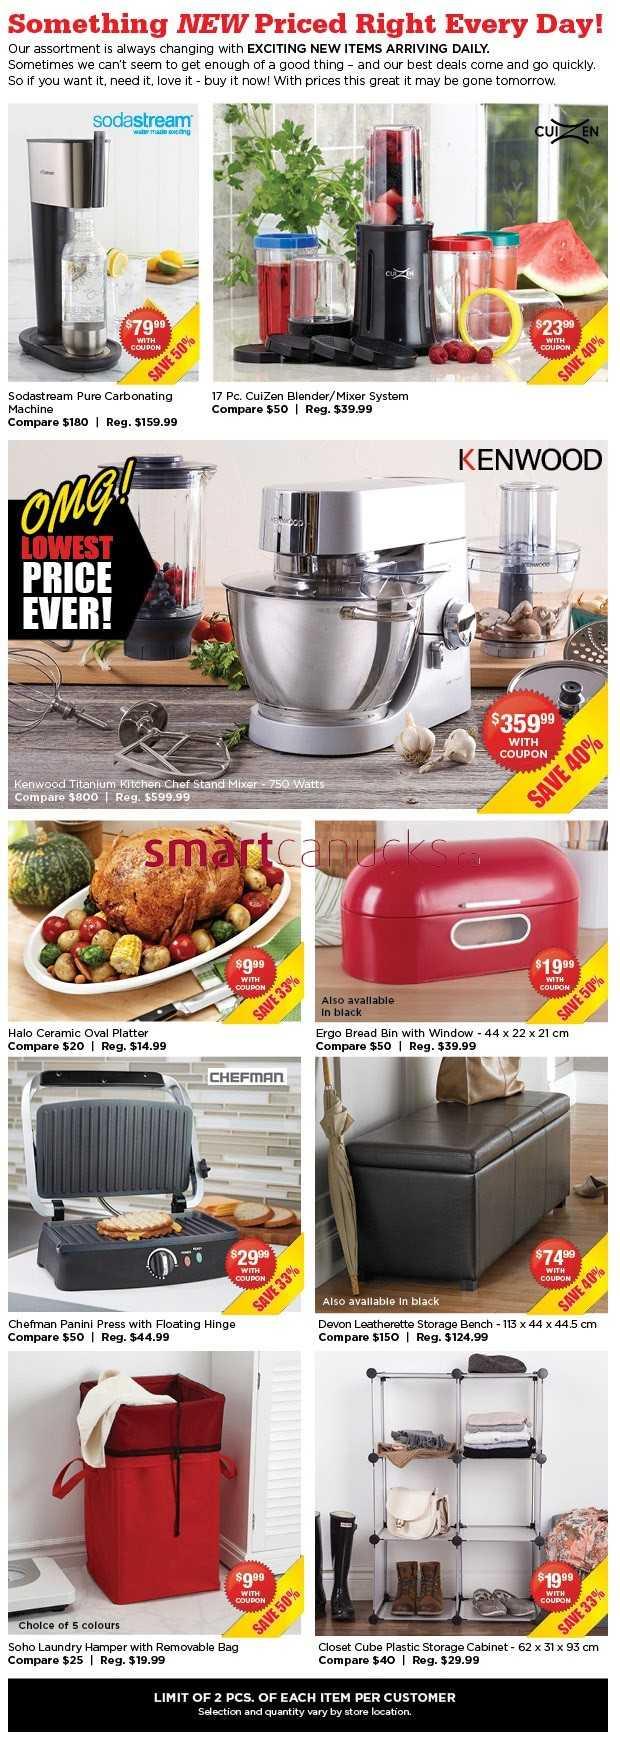 Kitchen stuff plus red hot deals november